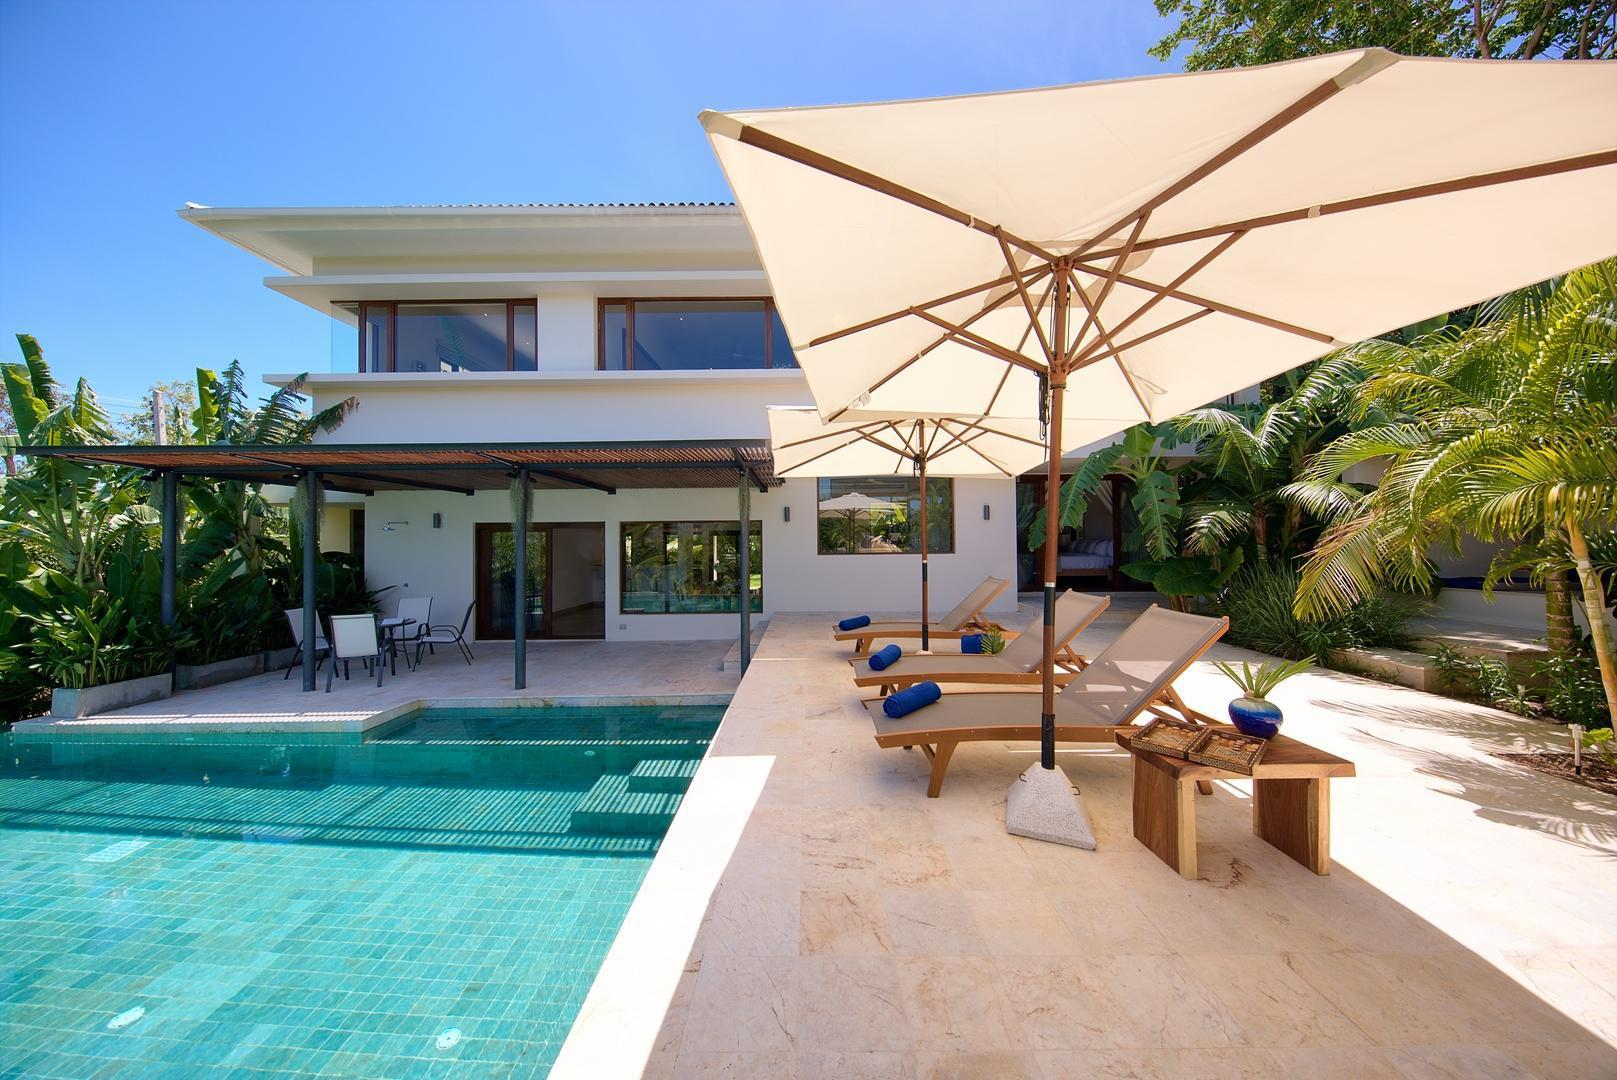 Villa Santika 5 BDRM Private Pool / Atmosphere Villa Santika 5 BDRM Private Pool / Atmosphere